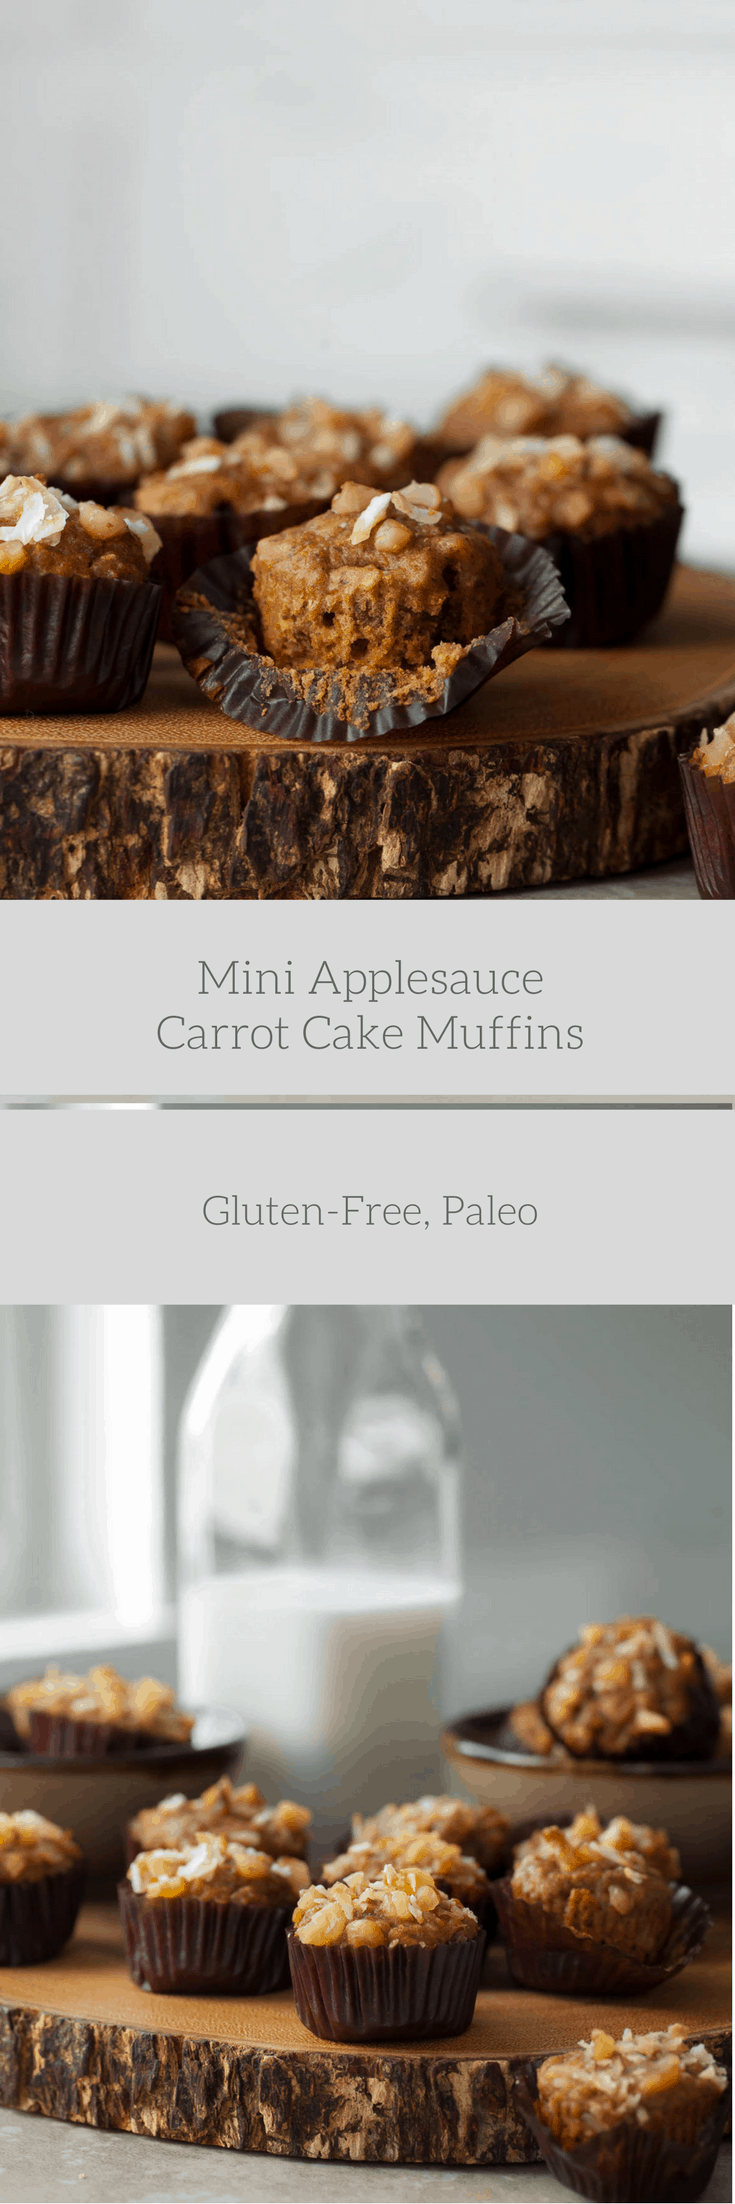 Mini Applesauce Carrot Cake Muffins Gluten Free Paleo Gourmande